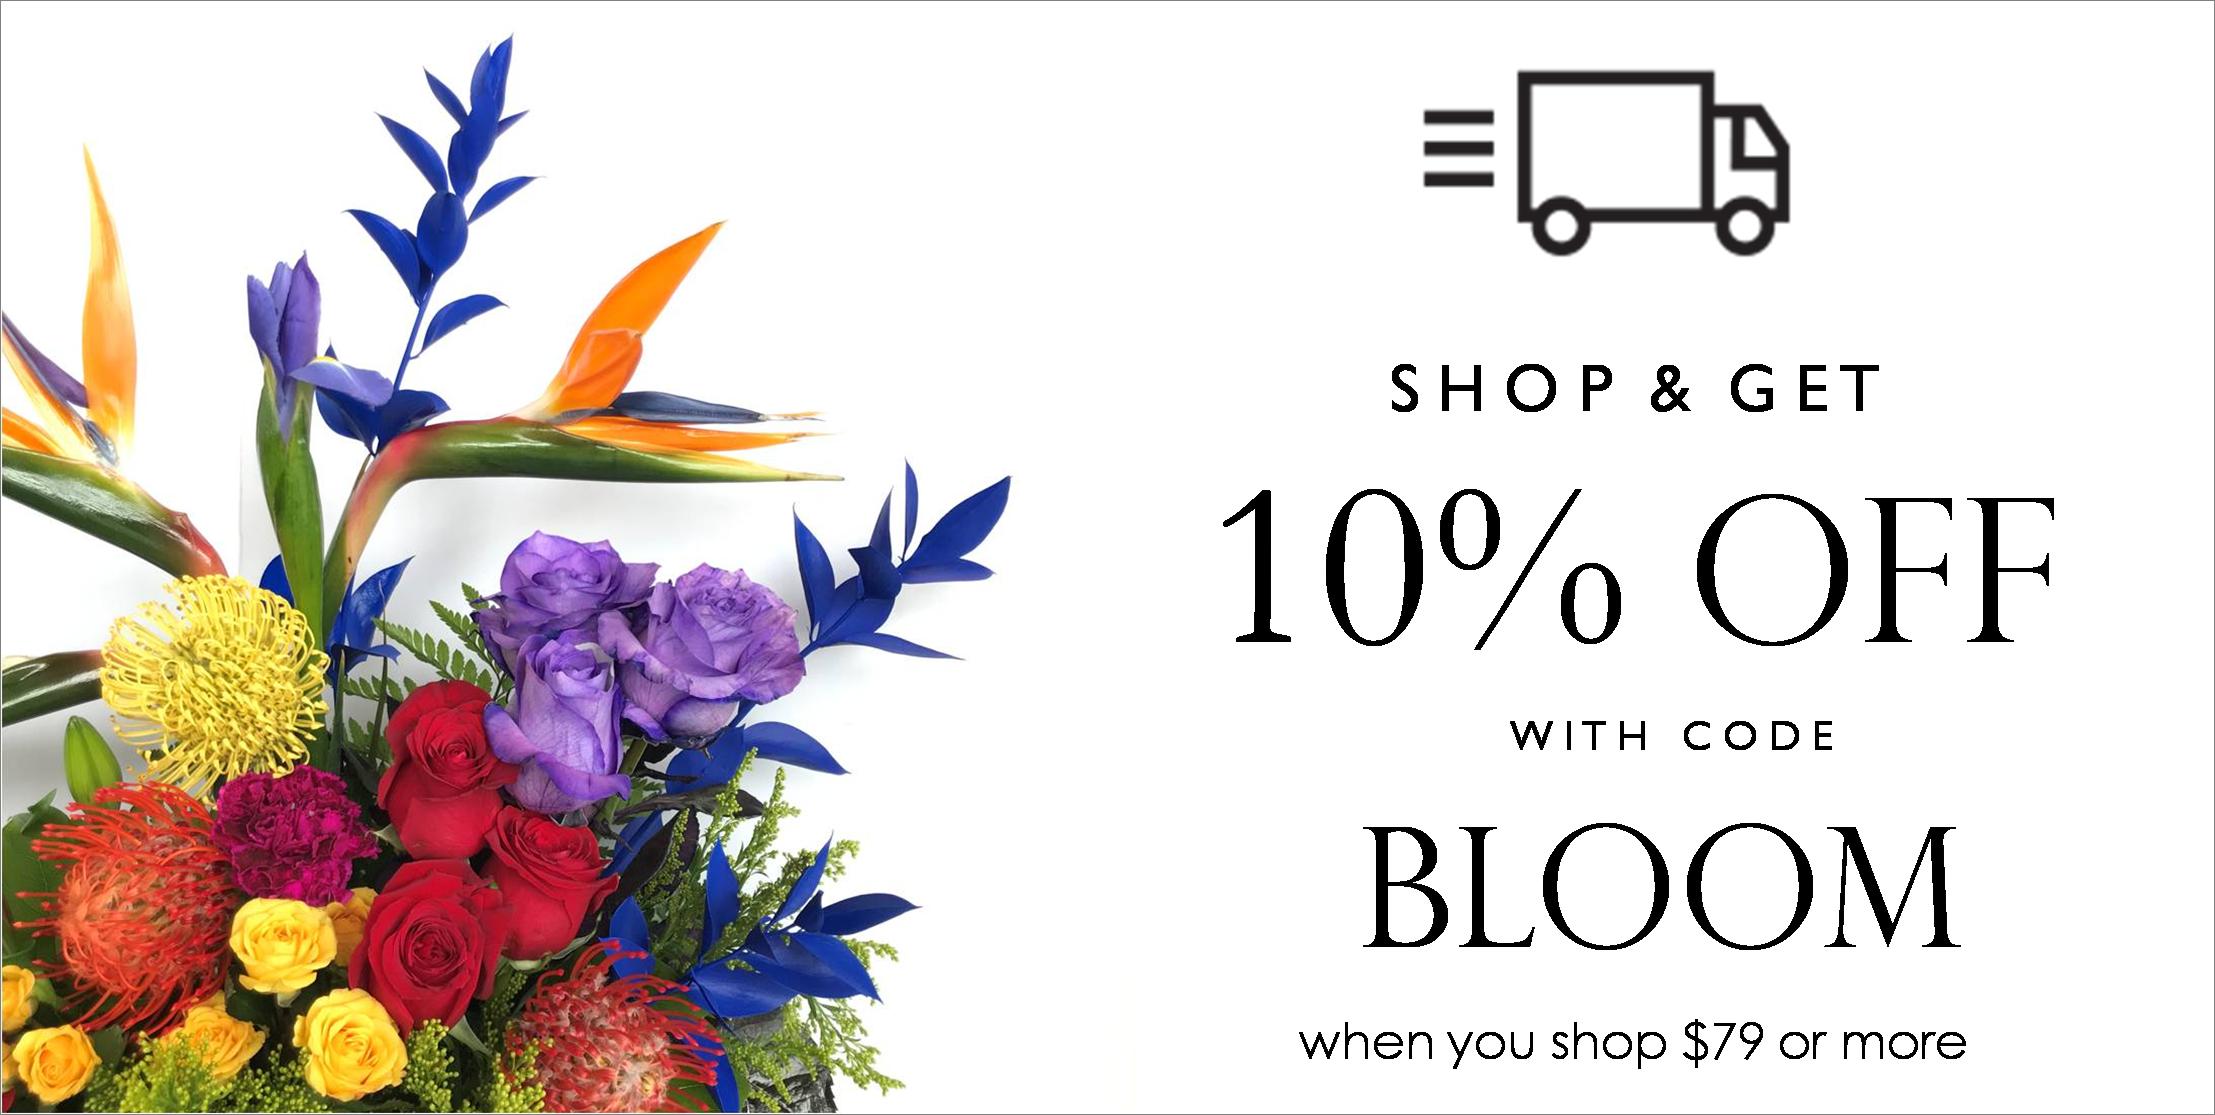 1we-make-el-paso-bloom-with-luxury-gift-rose-boxes-angies-floral-designs-angies-we-make-el-paso-el-paso-florist-birthdays-bloom-floral-instagram-love-delivery-rose-birthday-delivery-el-paso-florist-angies-flower.png